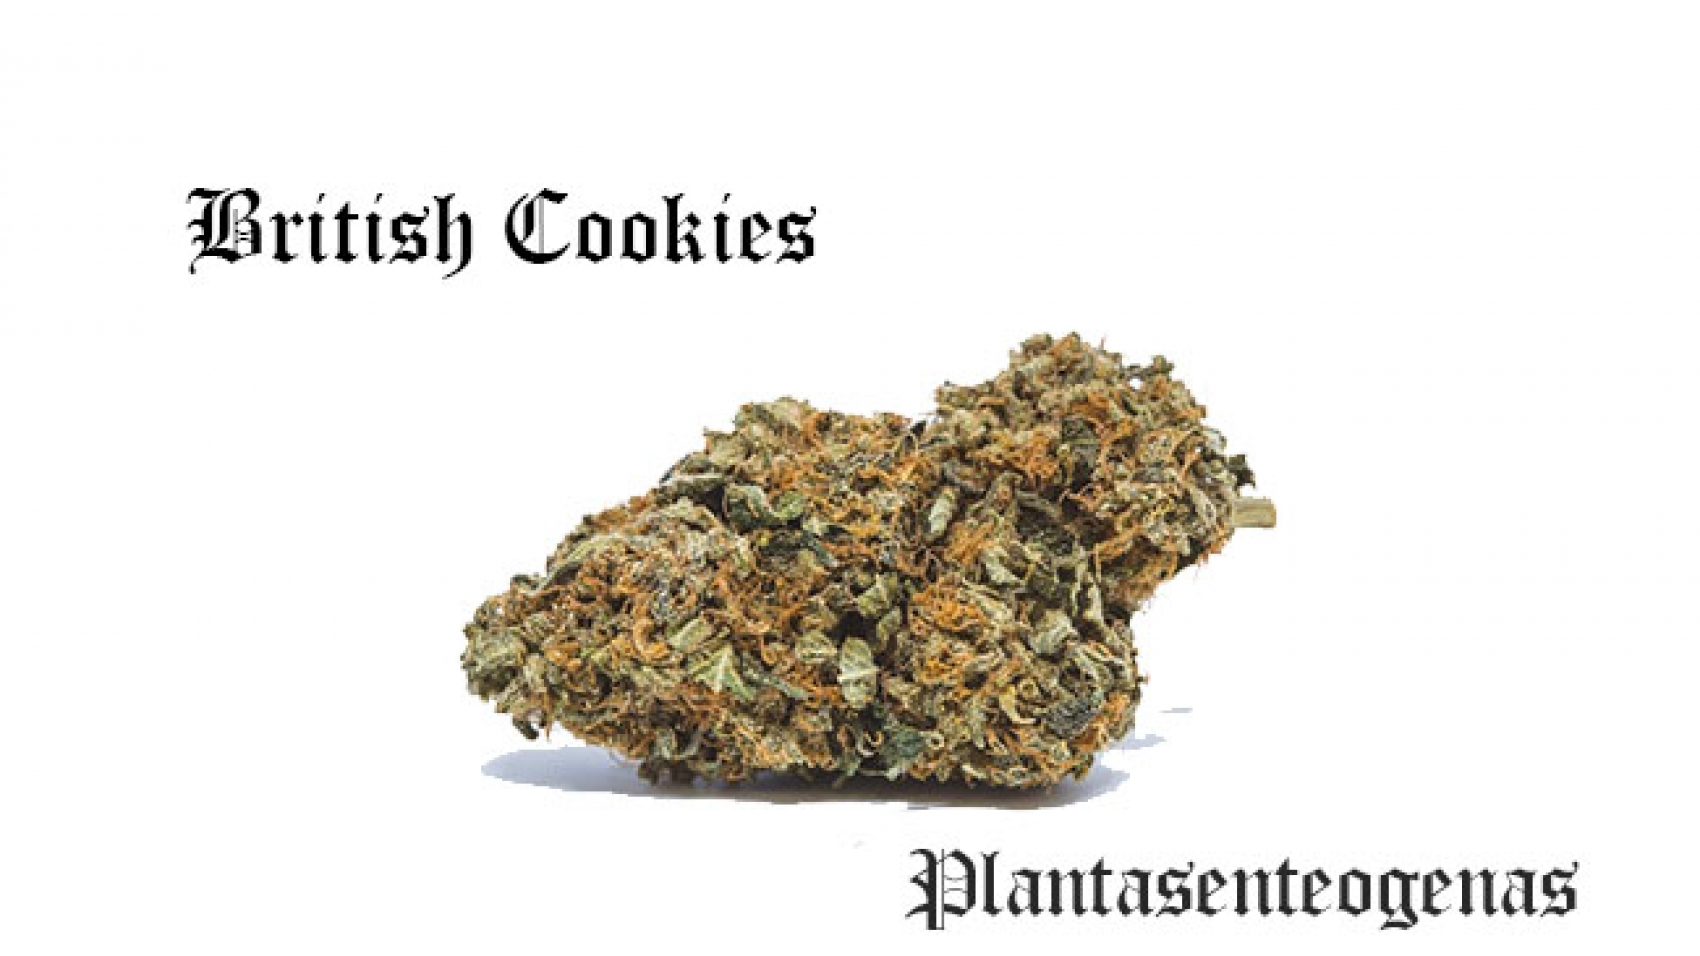 British Cookies